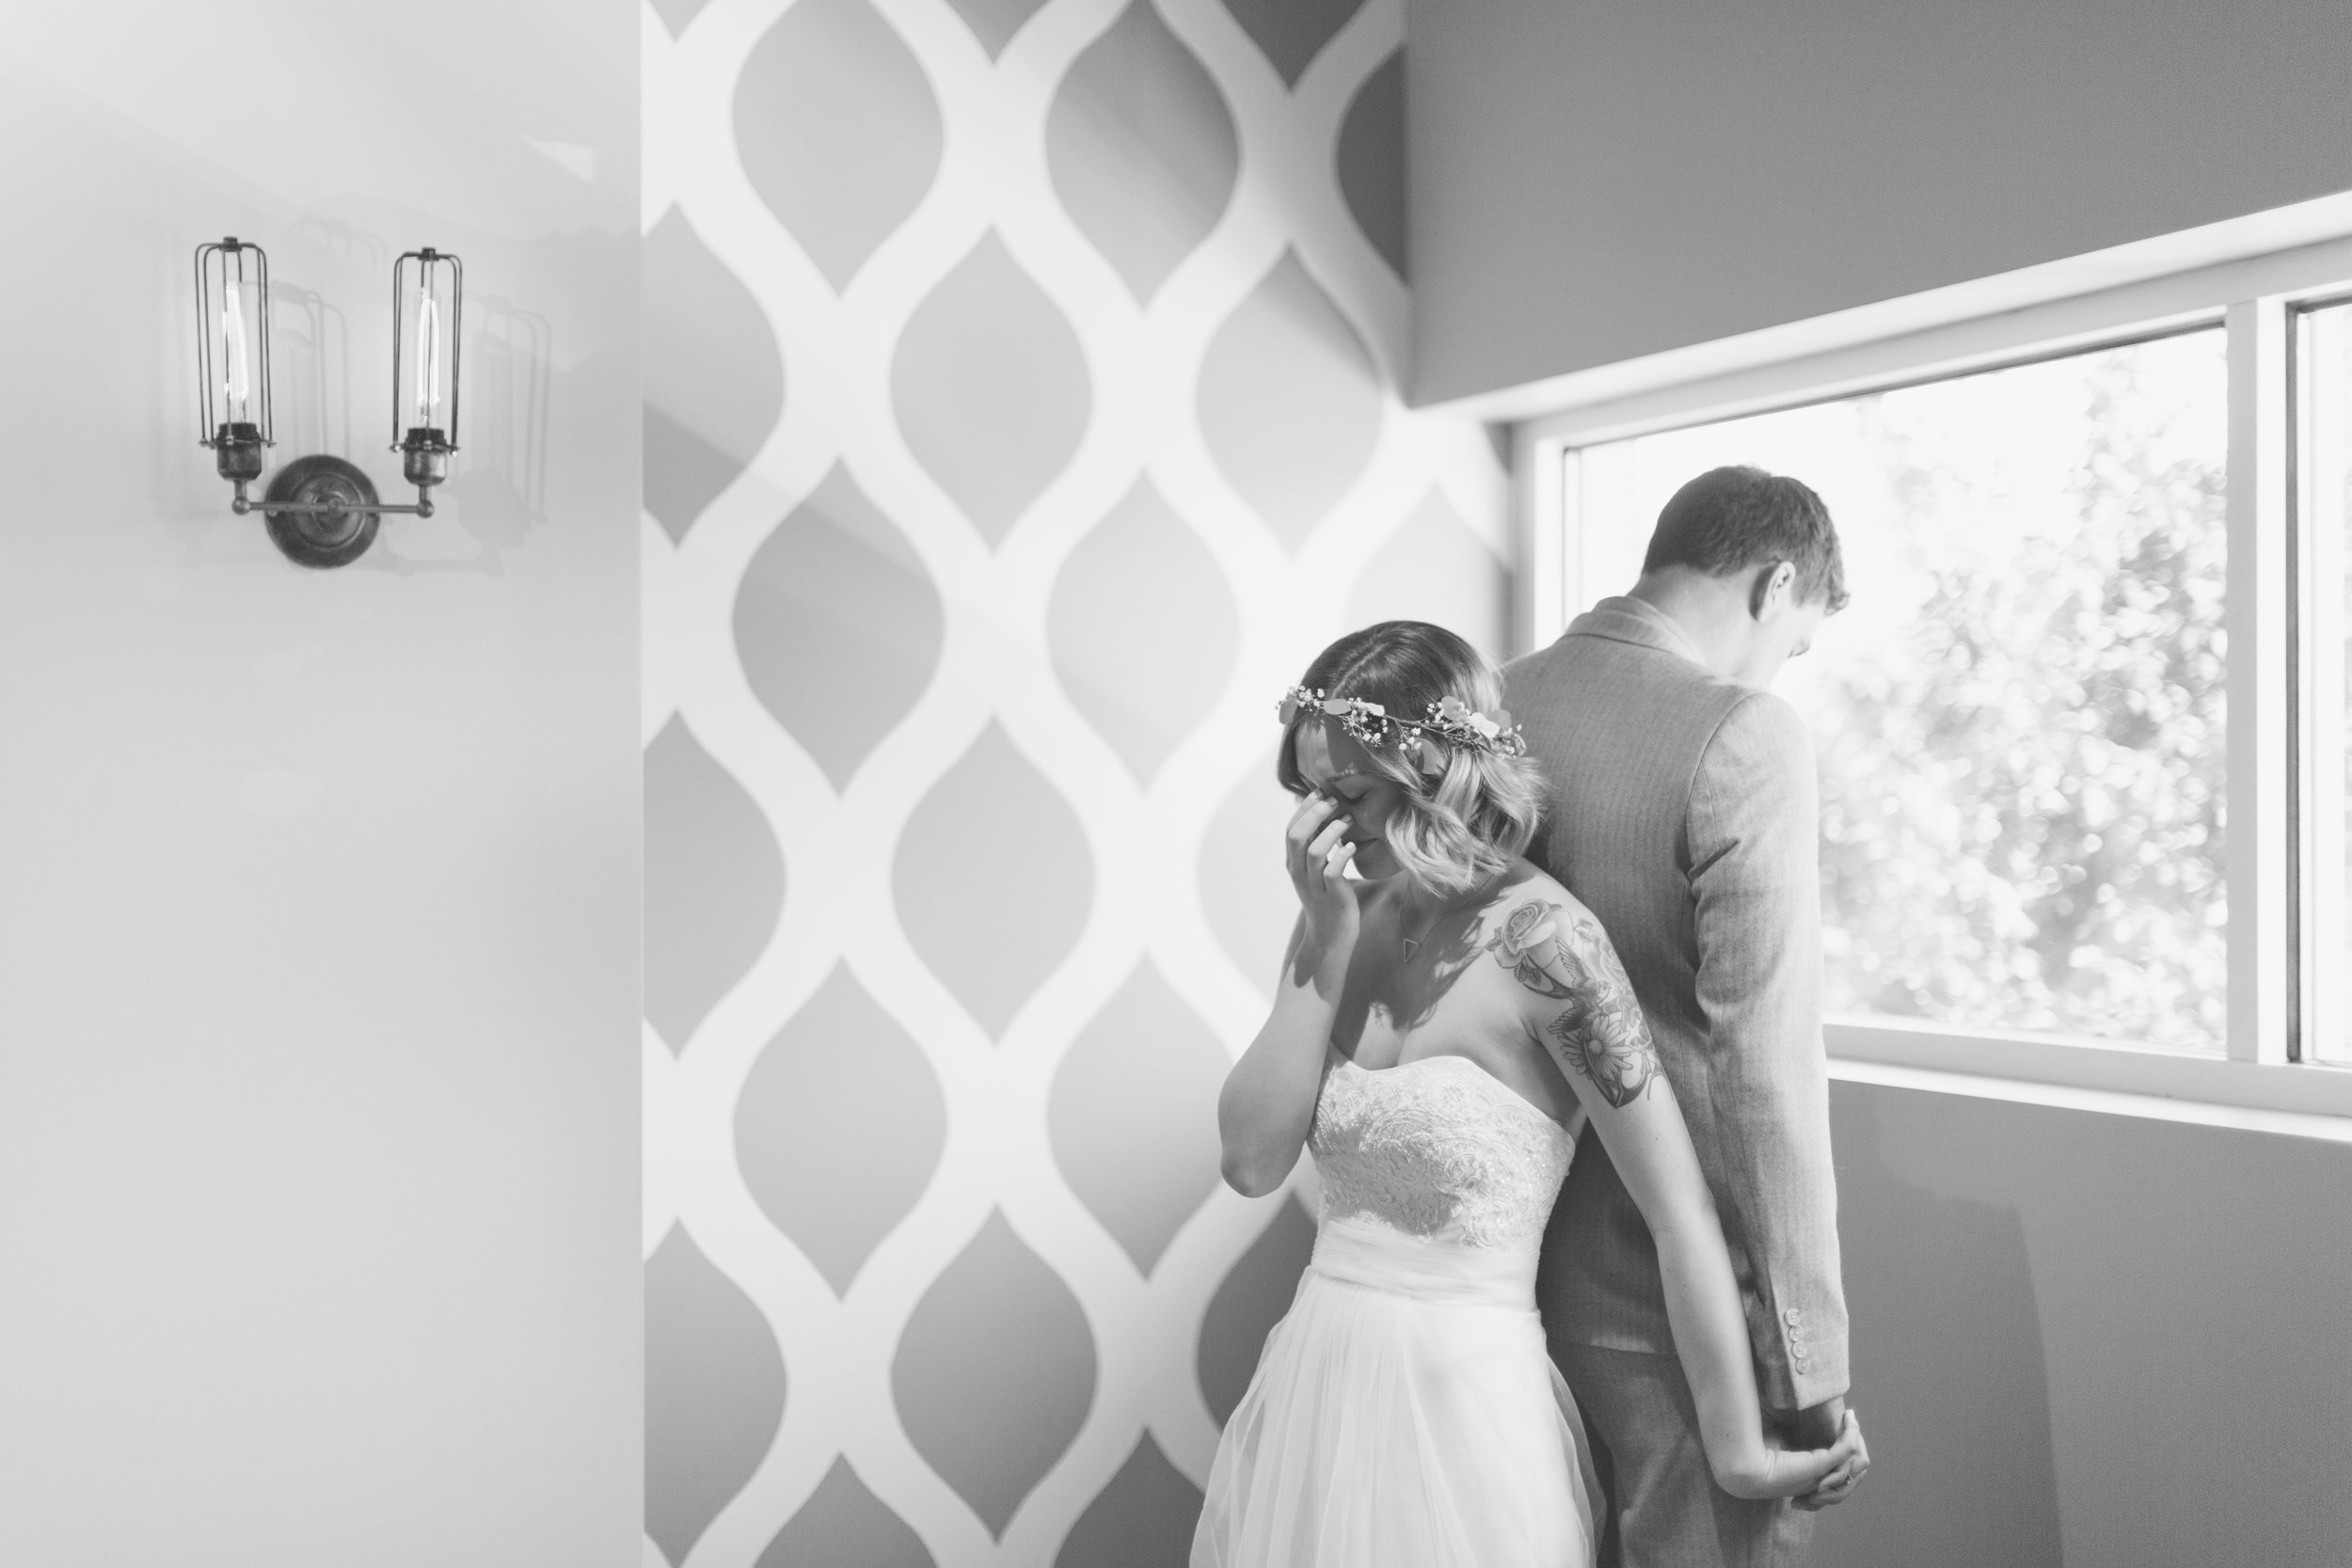 clayton+kennedy-married-138.jpg